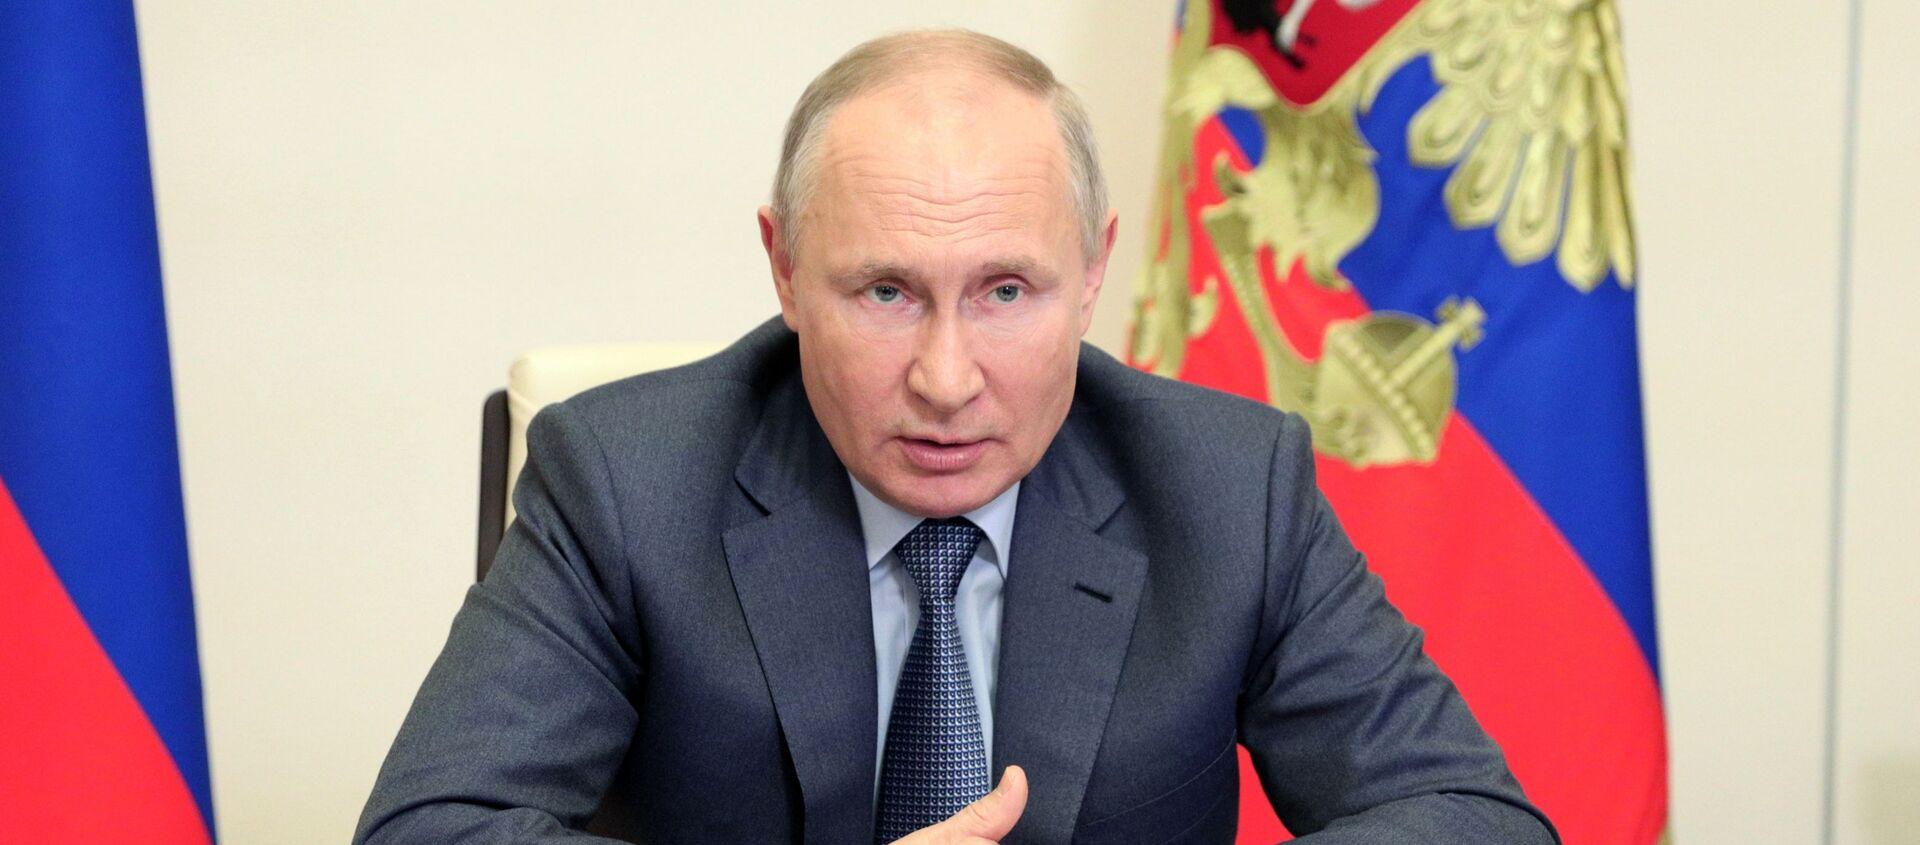 Tổng thống Nga Vladimir Putin - Sputnik Việt Nam, 1920, 25.05.2021